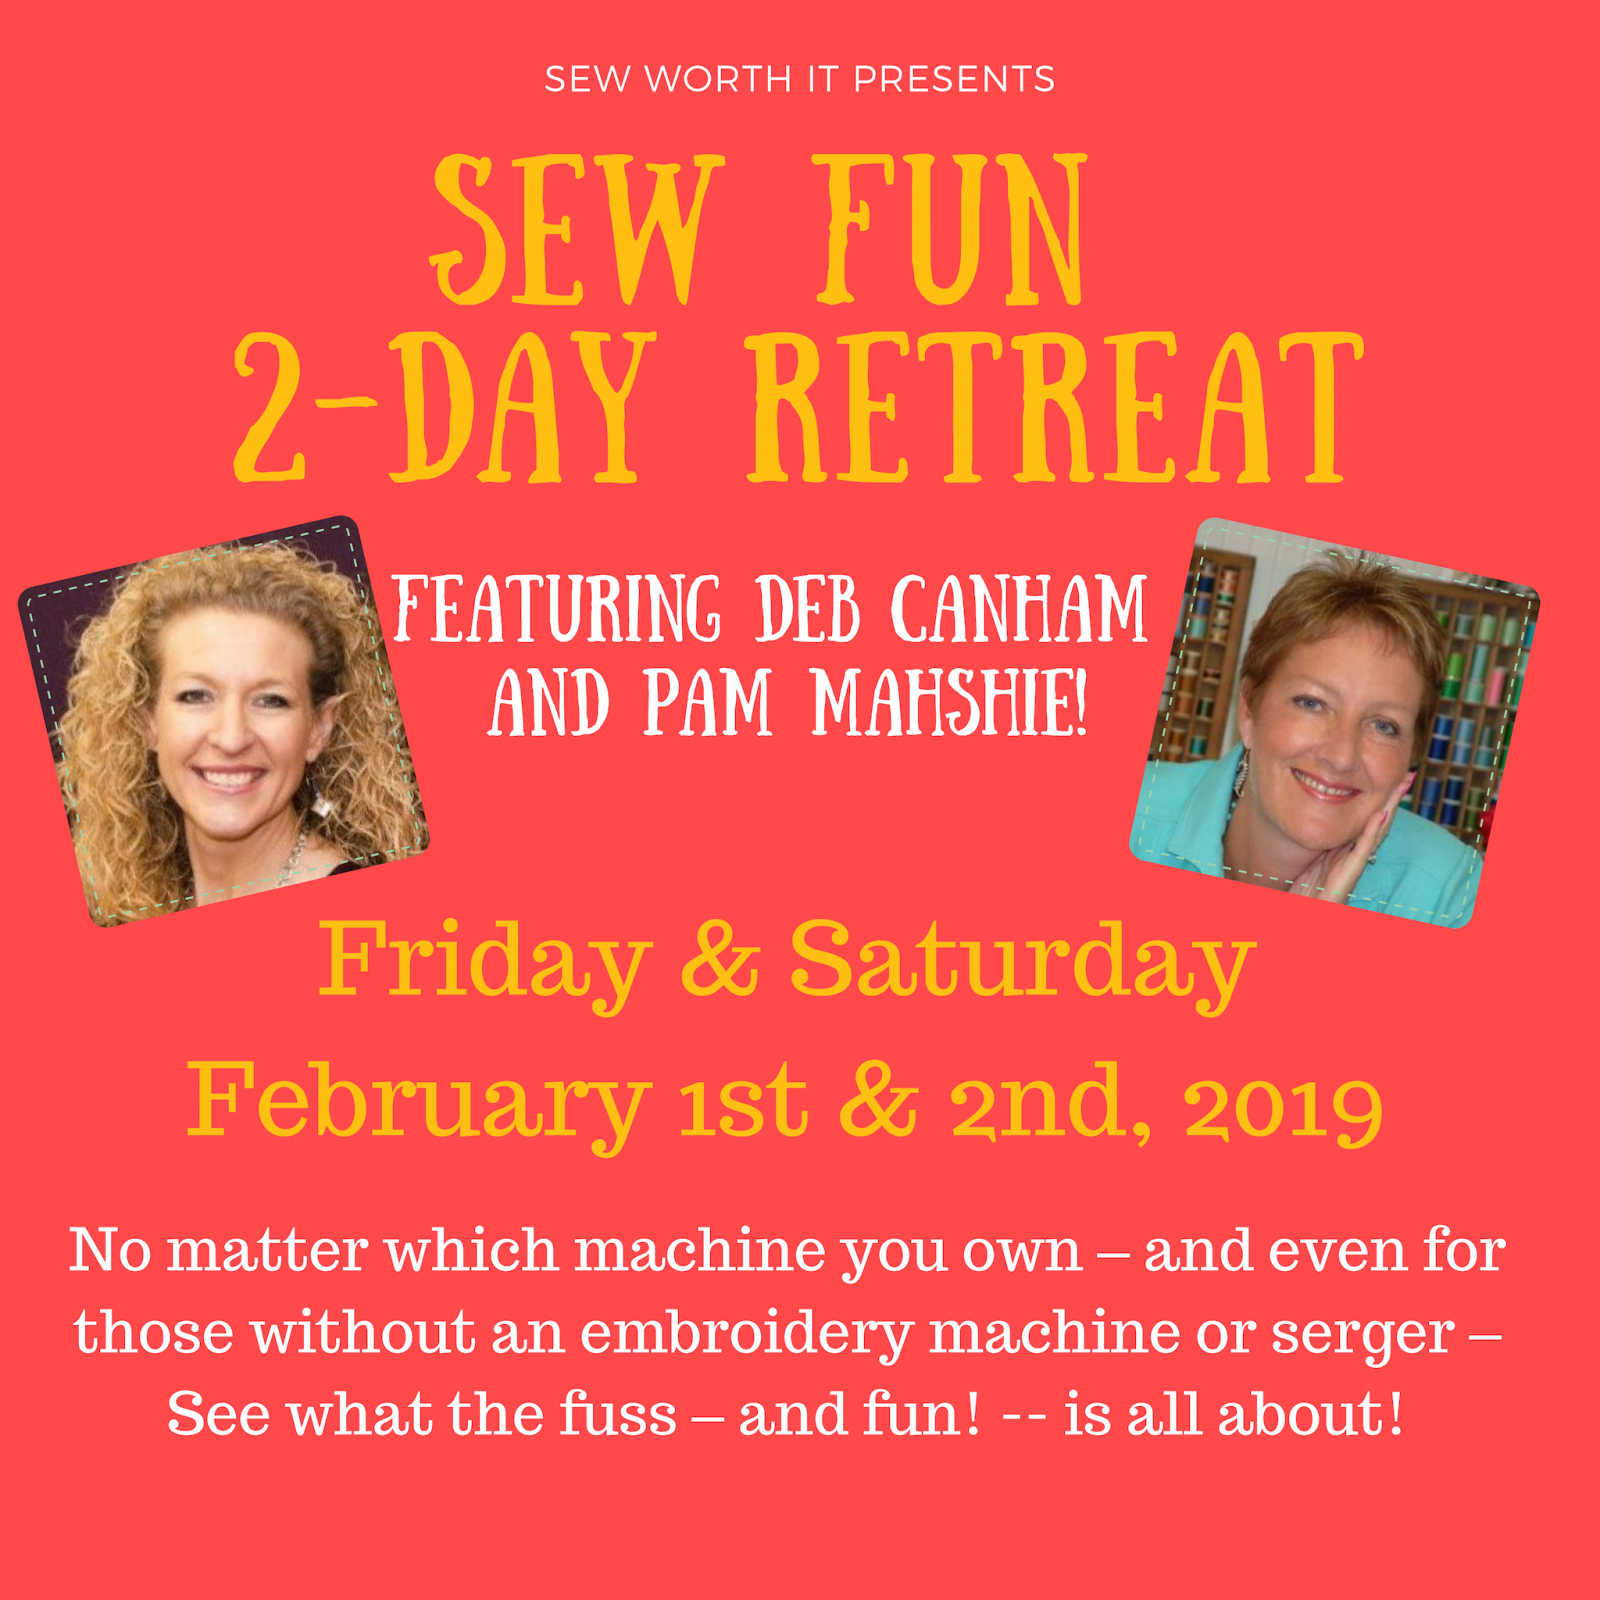 Sew Fun 2-Day Retreat February 2019